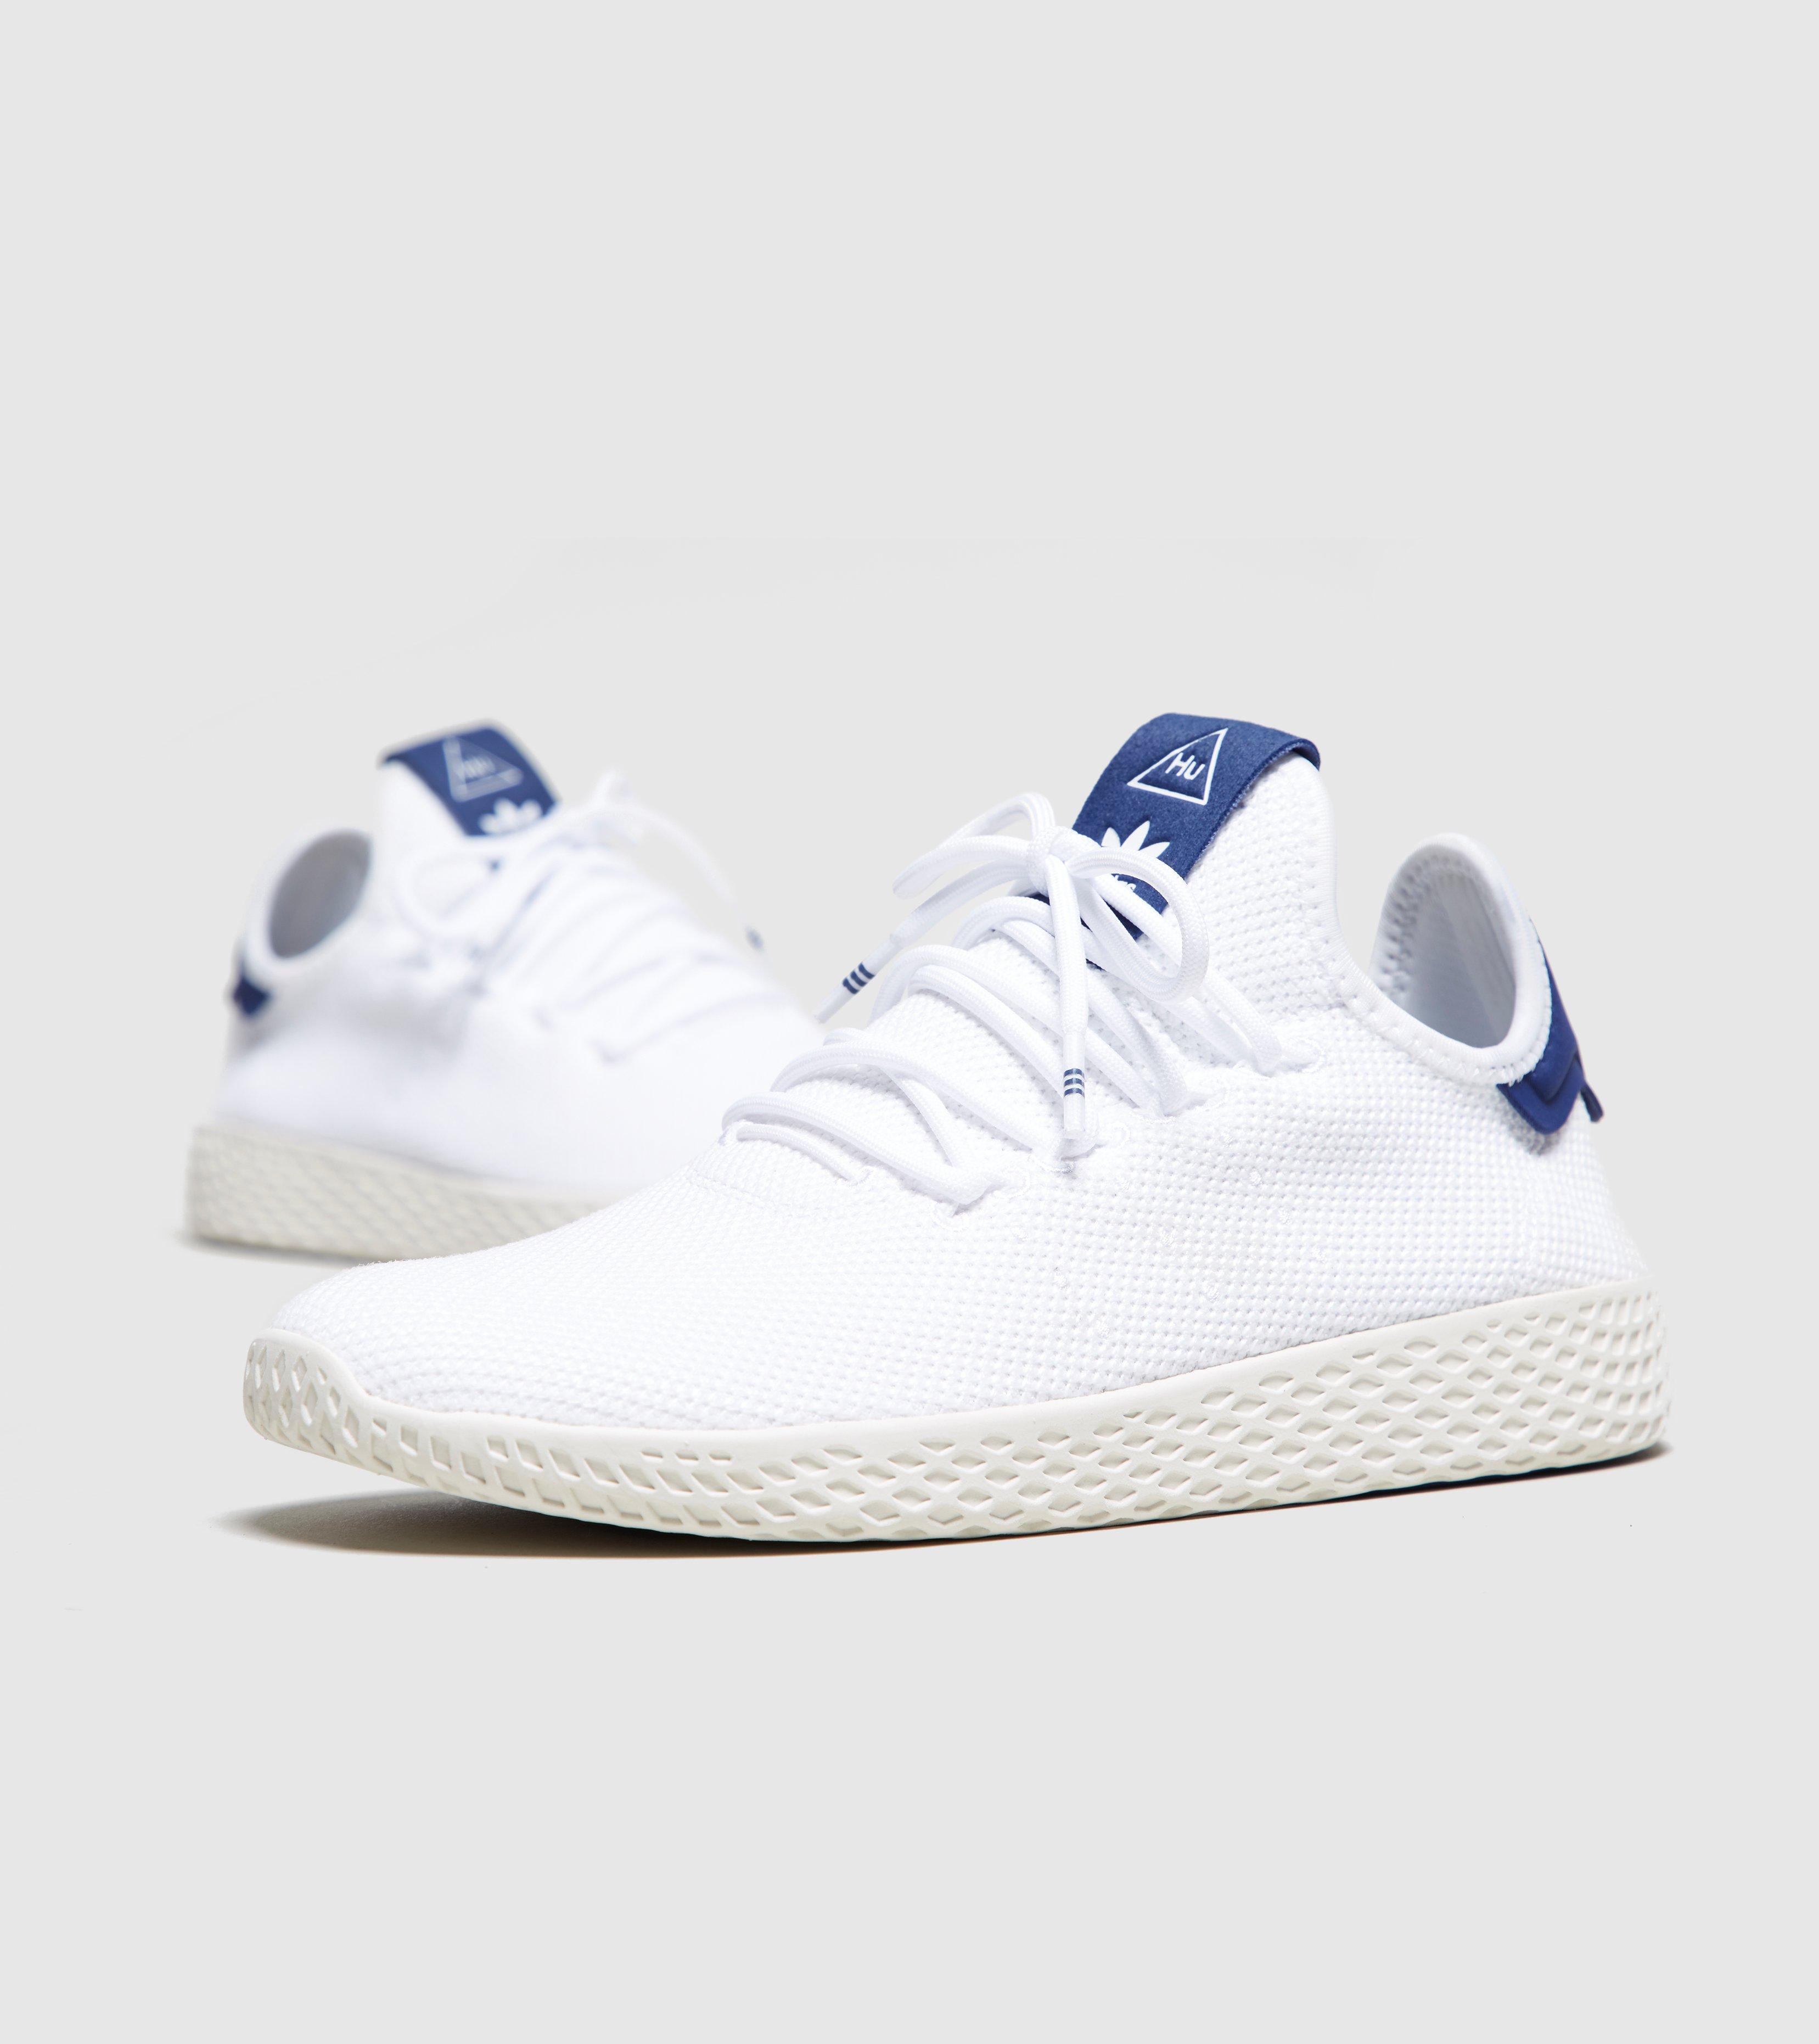 adidas Originals X Pharrell Williams Tennis Hu Women's Lyst